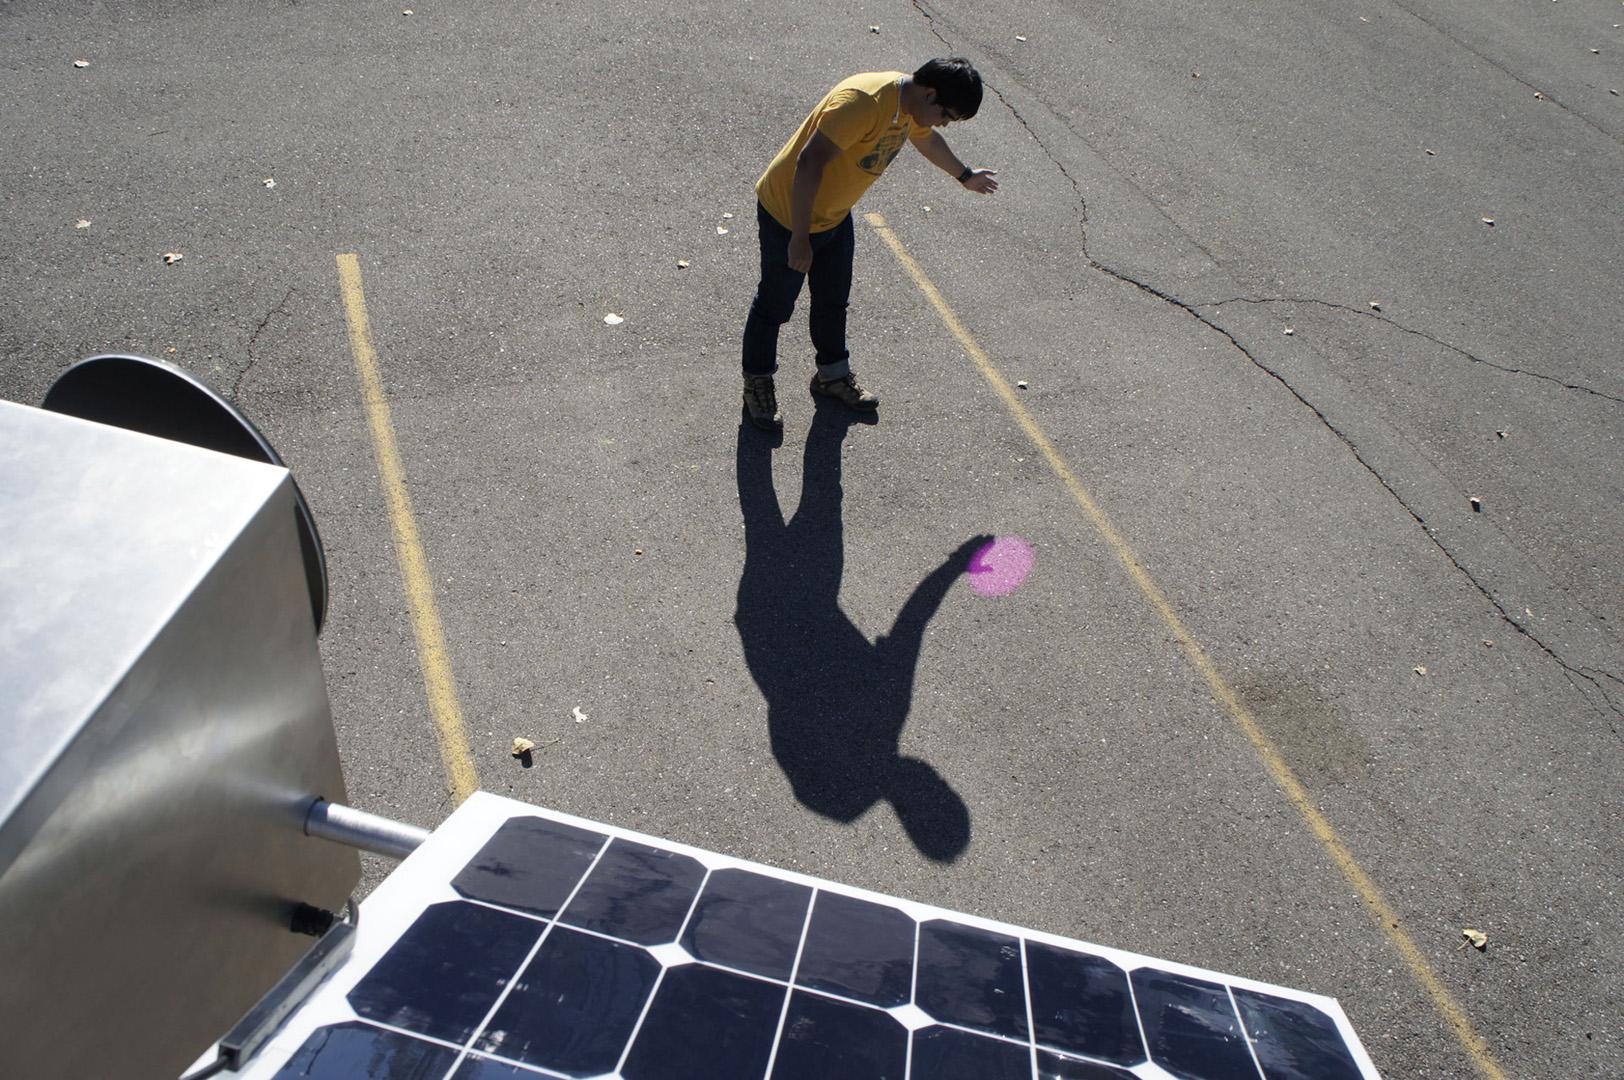 ©, Roland Graf, Solar Pink Pong Street Video Game